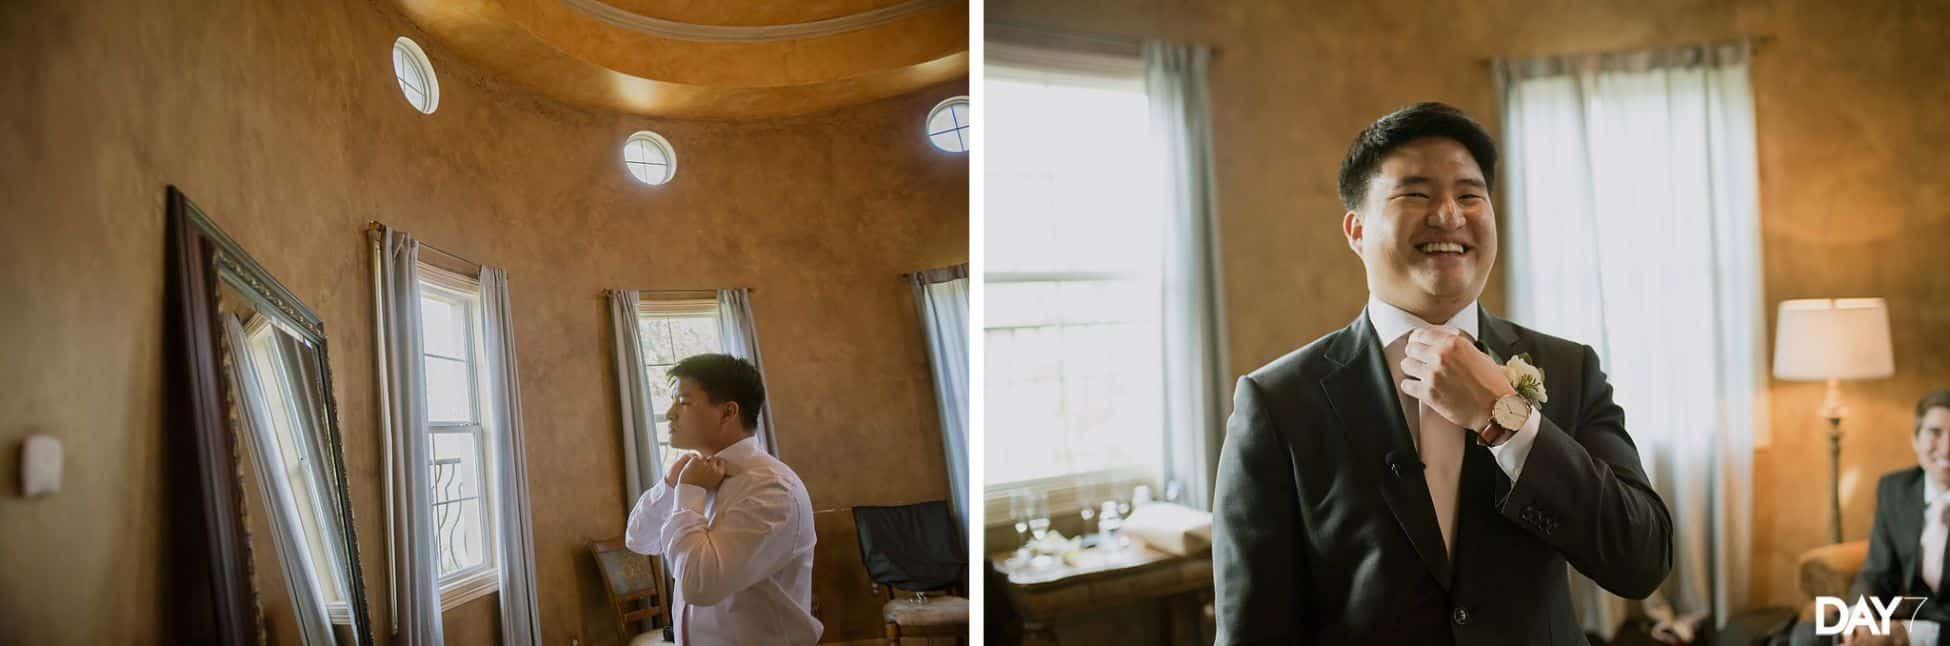 chateau-polonez-wedding-photos_0056